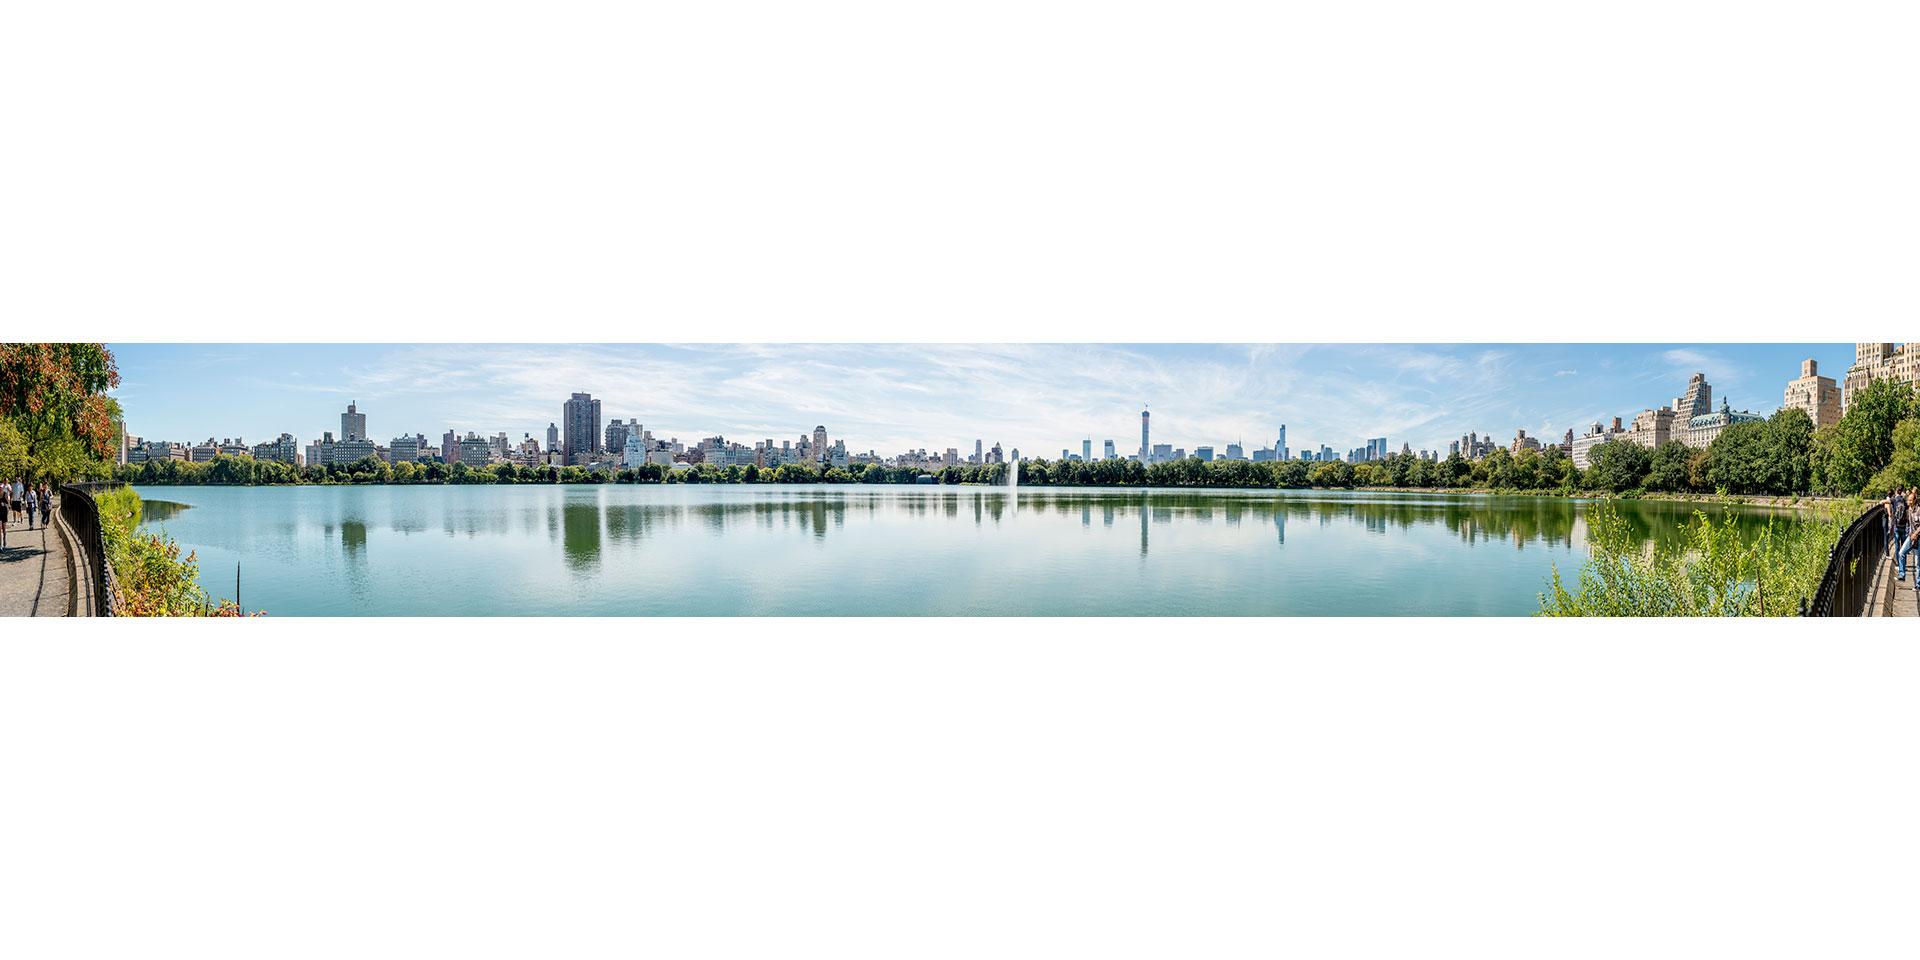 Central Park Reservoir | Jacqueline Kennedy Onassis Reservoir - New York - USA